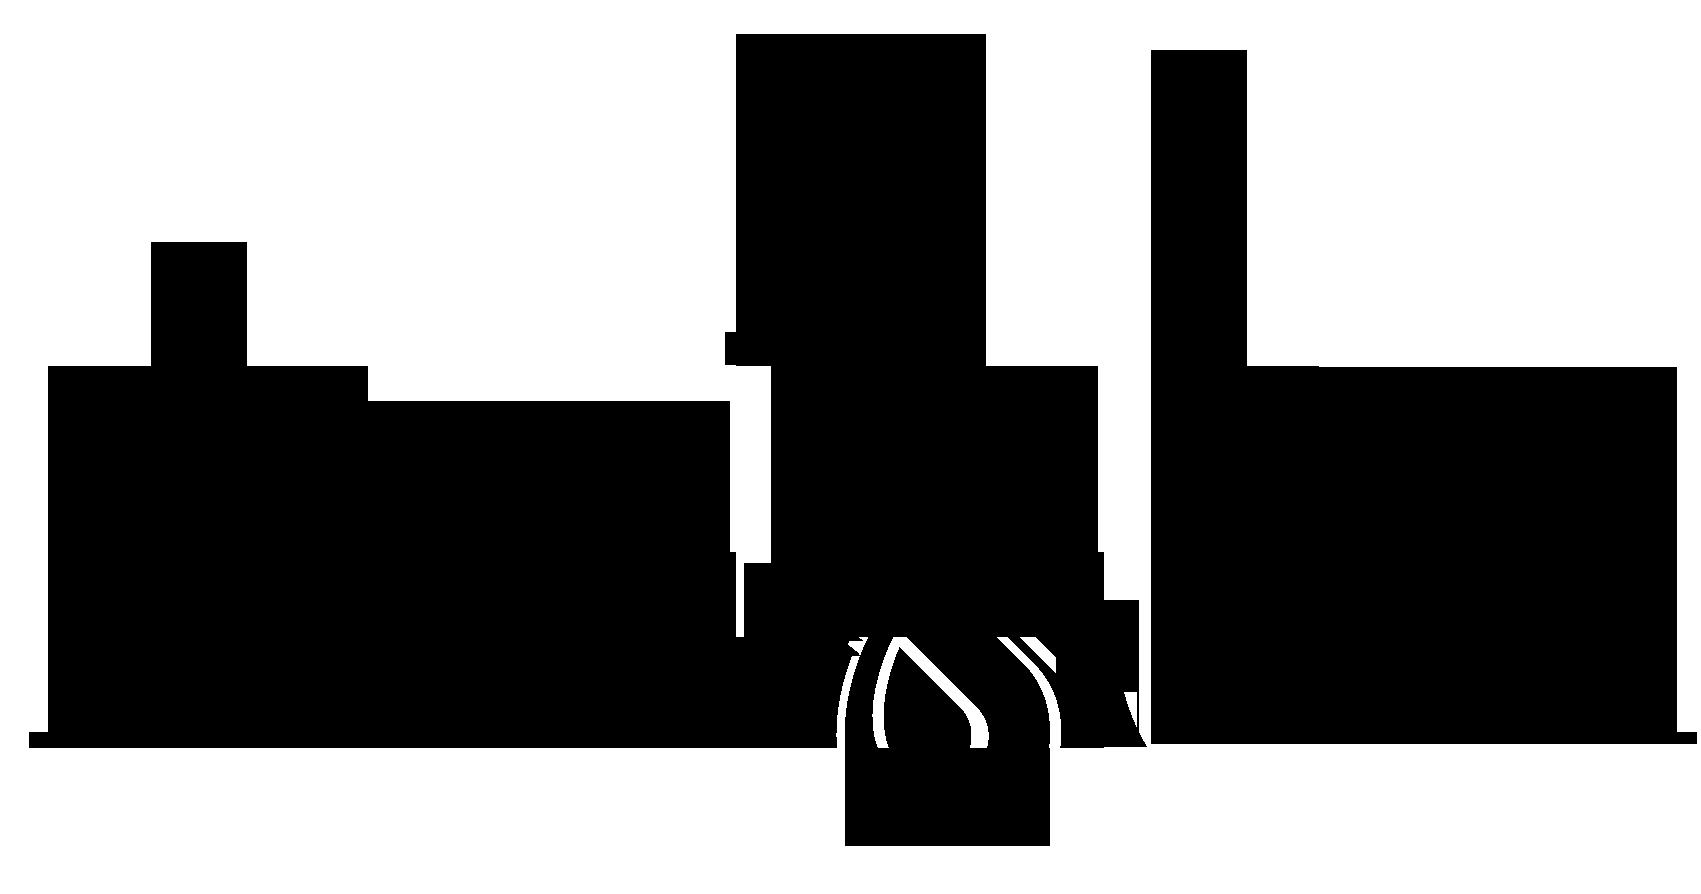 صور رمزيات اسم عائشة وخلفيات مكتوب عليها (5)